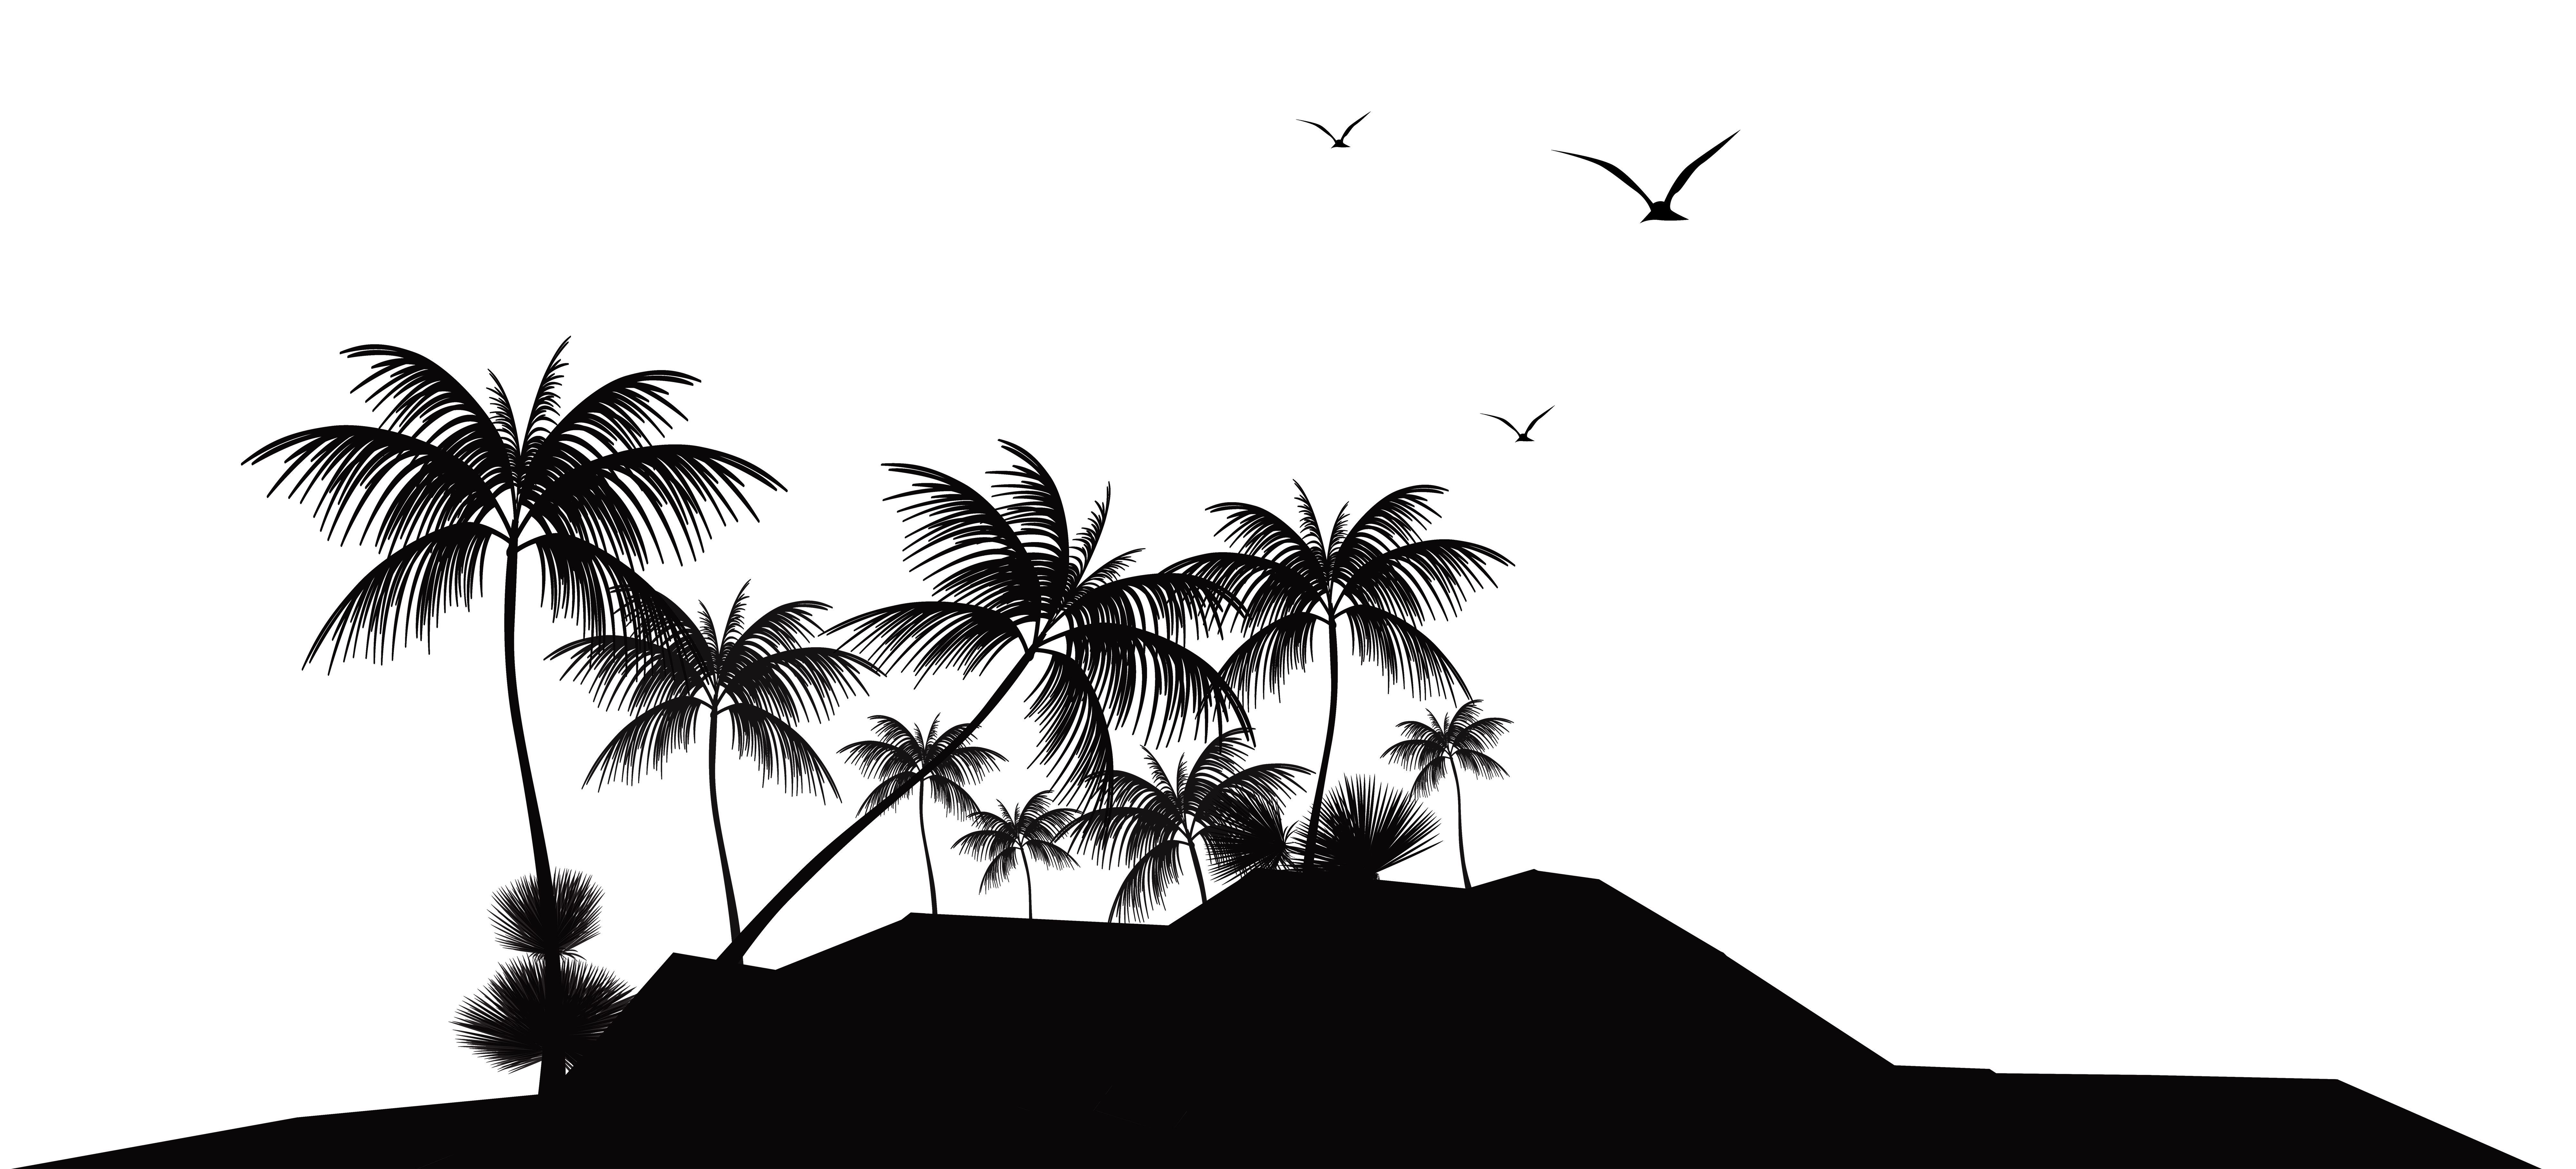 Silhouette Island Tropical Islands Resort Clip art.